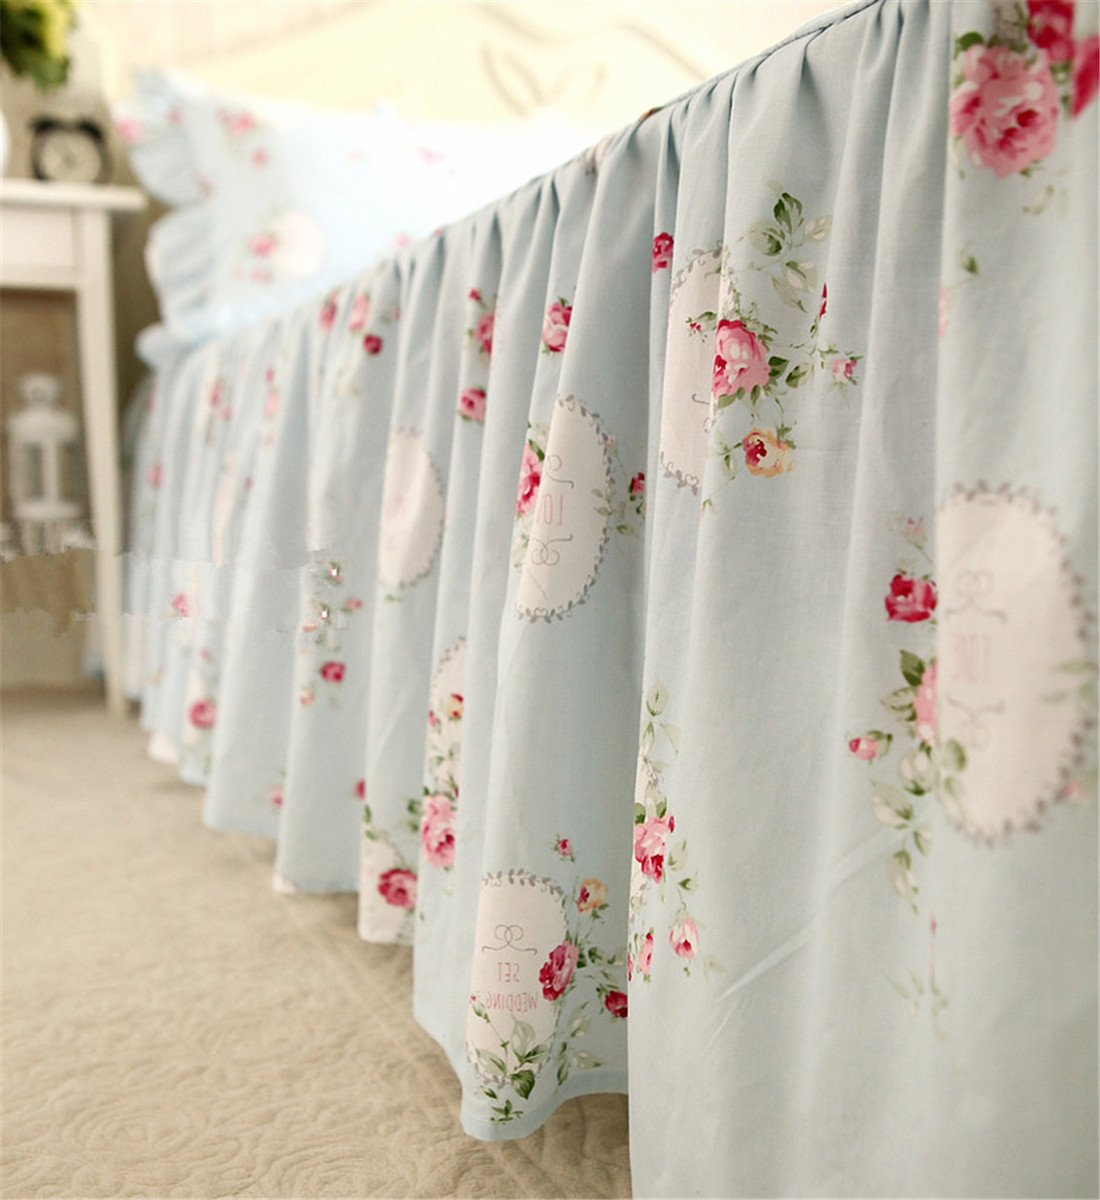 Lotus Karen 100%Cotton Blue Pastoral Flowers 4PC Floral Bed Sheet Set Ruffles Korean Bedding Set With Romantic Love Letters Patterns For Wedding Bedding King,1Duvet Cover,1Bedskirt,2Pillowcases by Lotus Karen (Image #5)